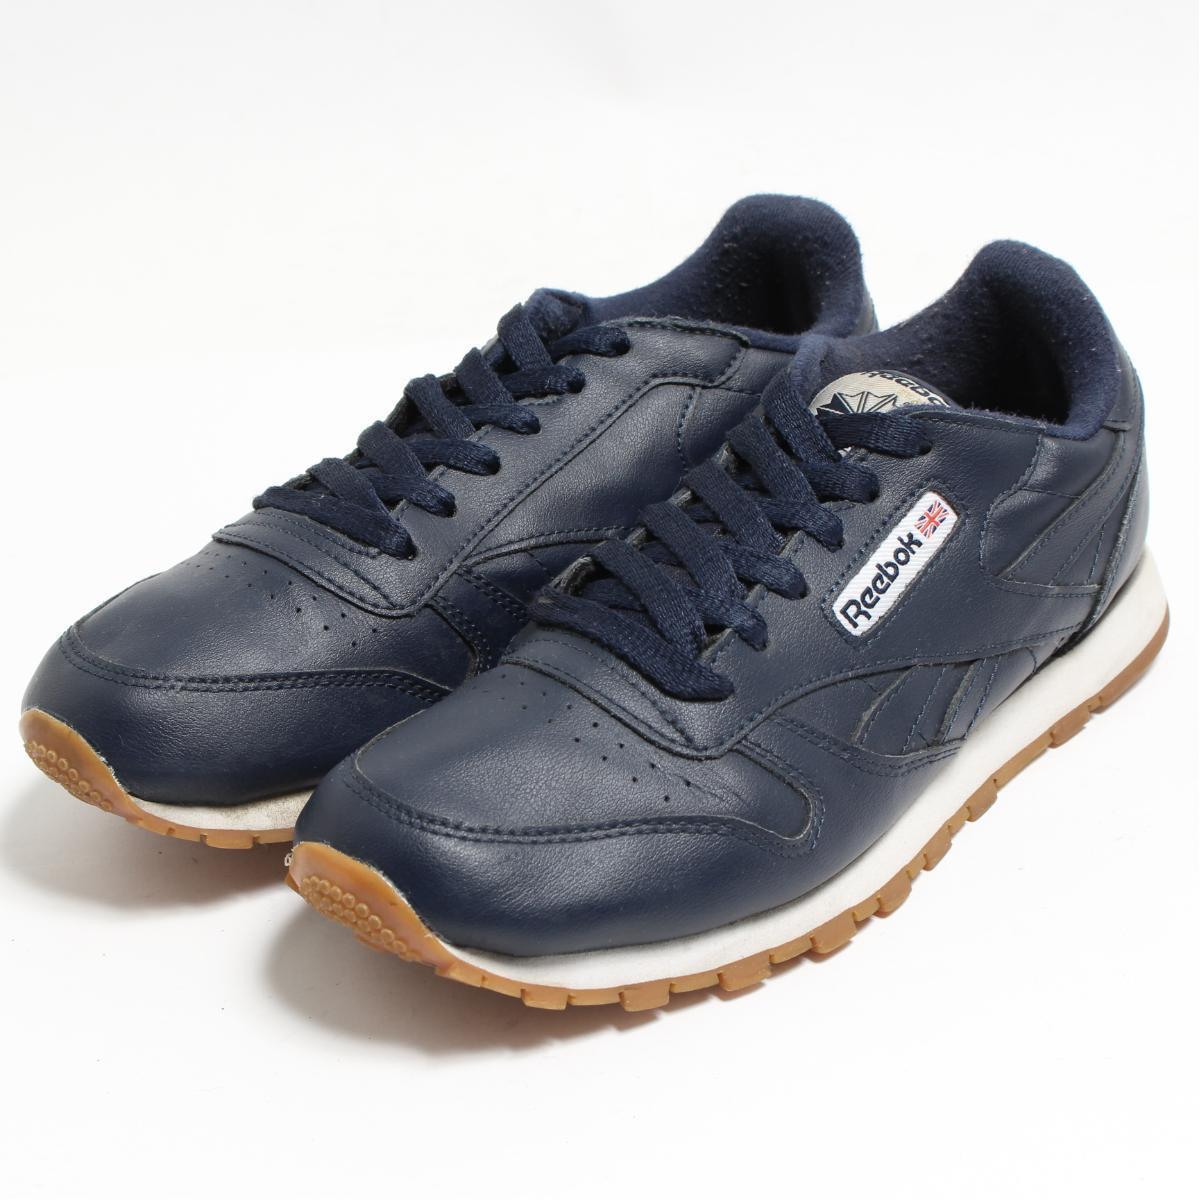 best loved 36049 eca5d Reebok Reebok CLASSIC classical music sneakers US4 Lady's 23.0cm /bon4581